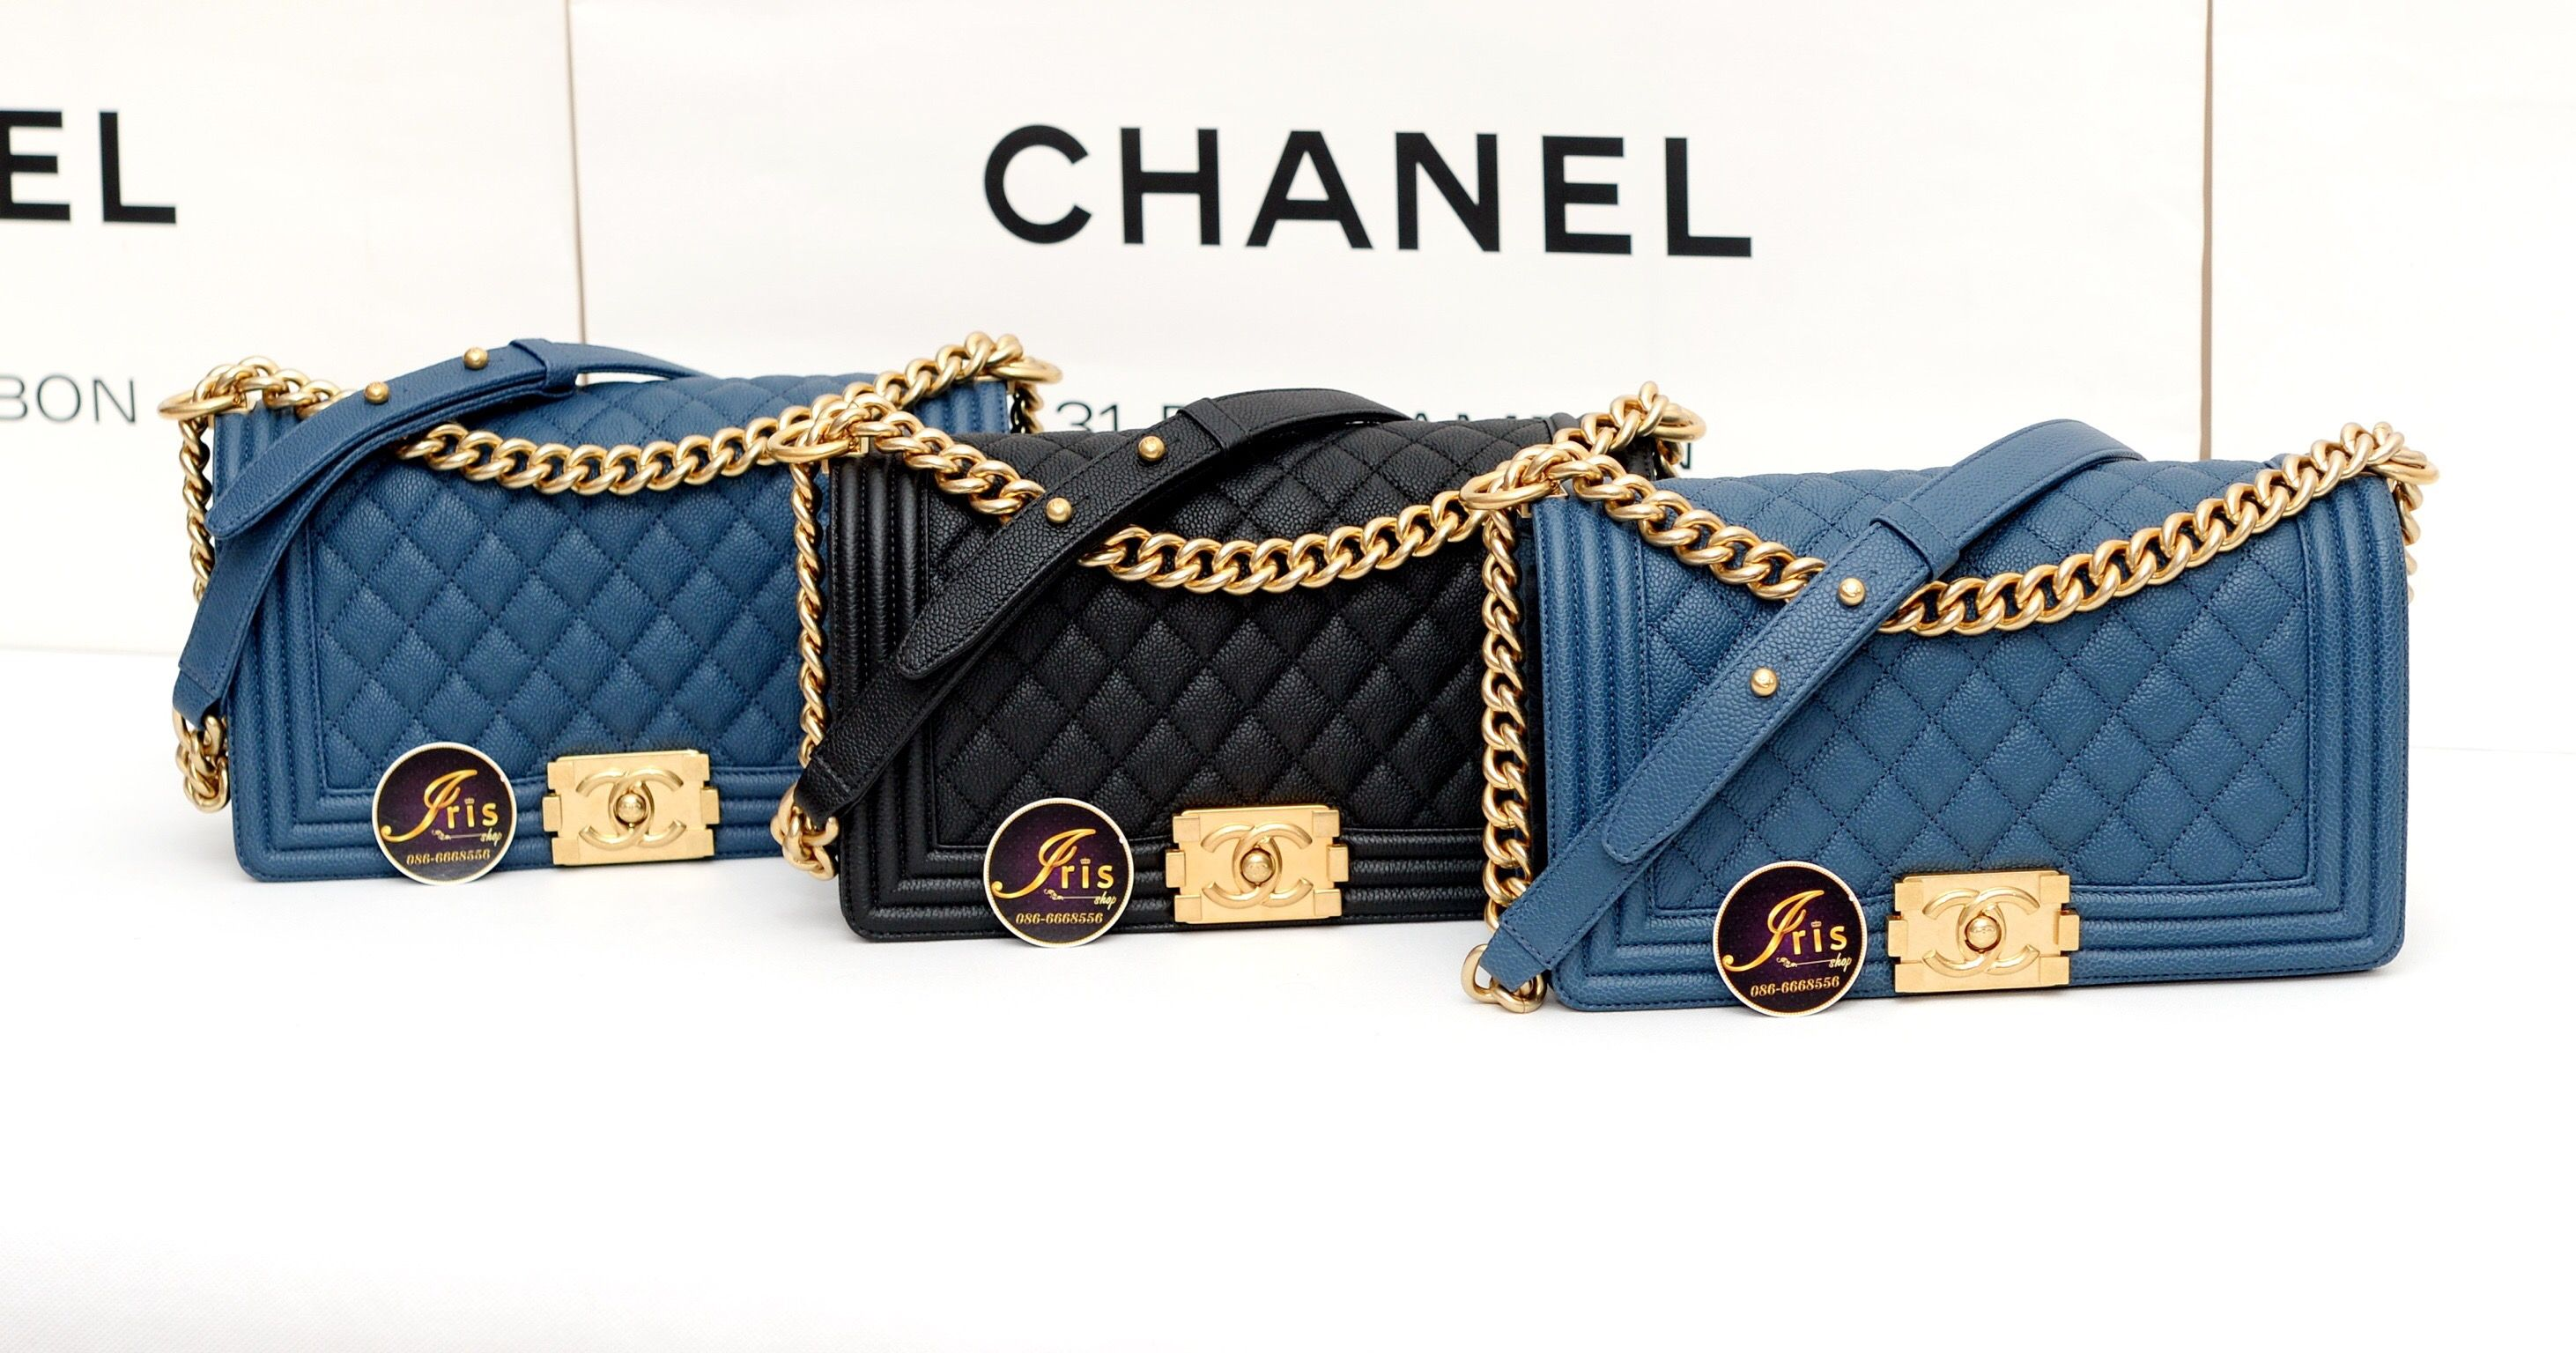 22aaf24cc4e8 กระเป๋า Chanel Boy 10